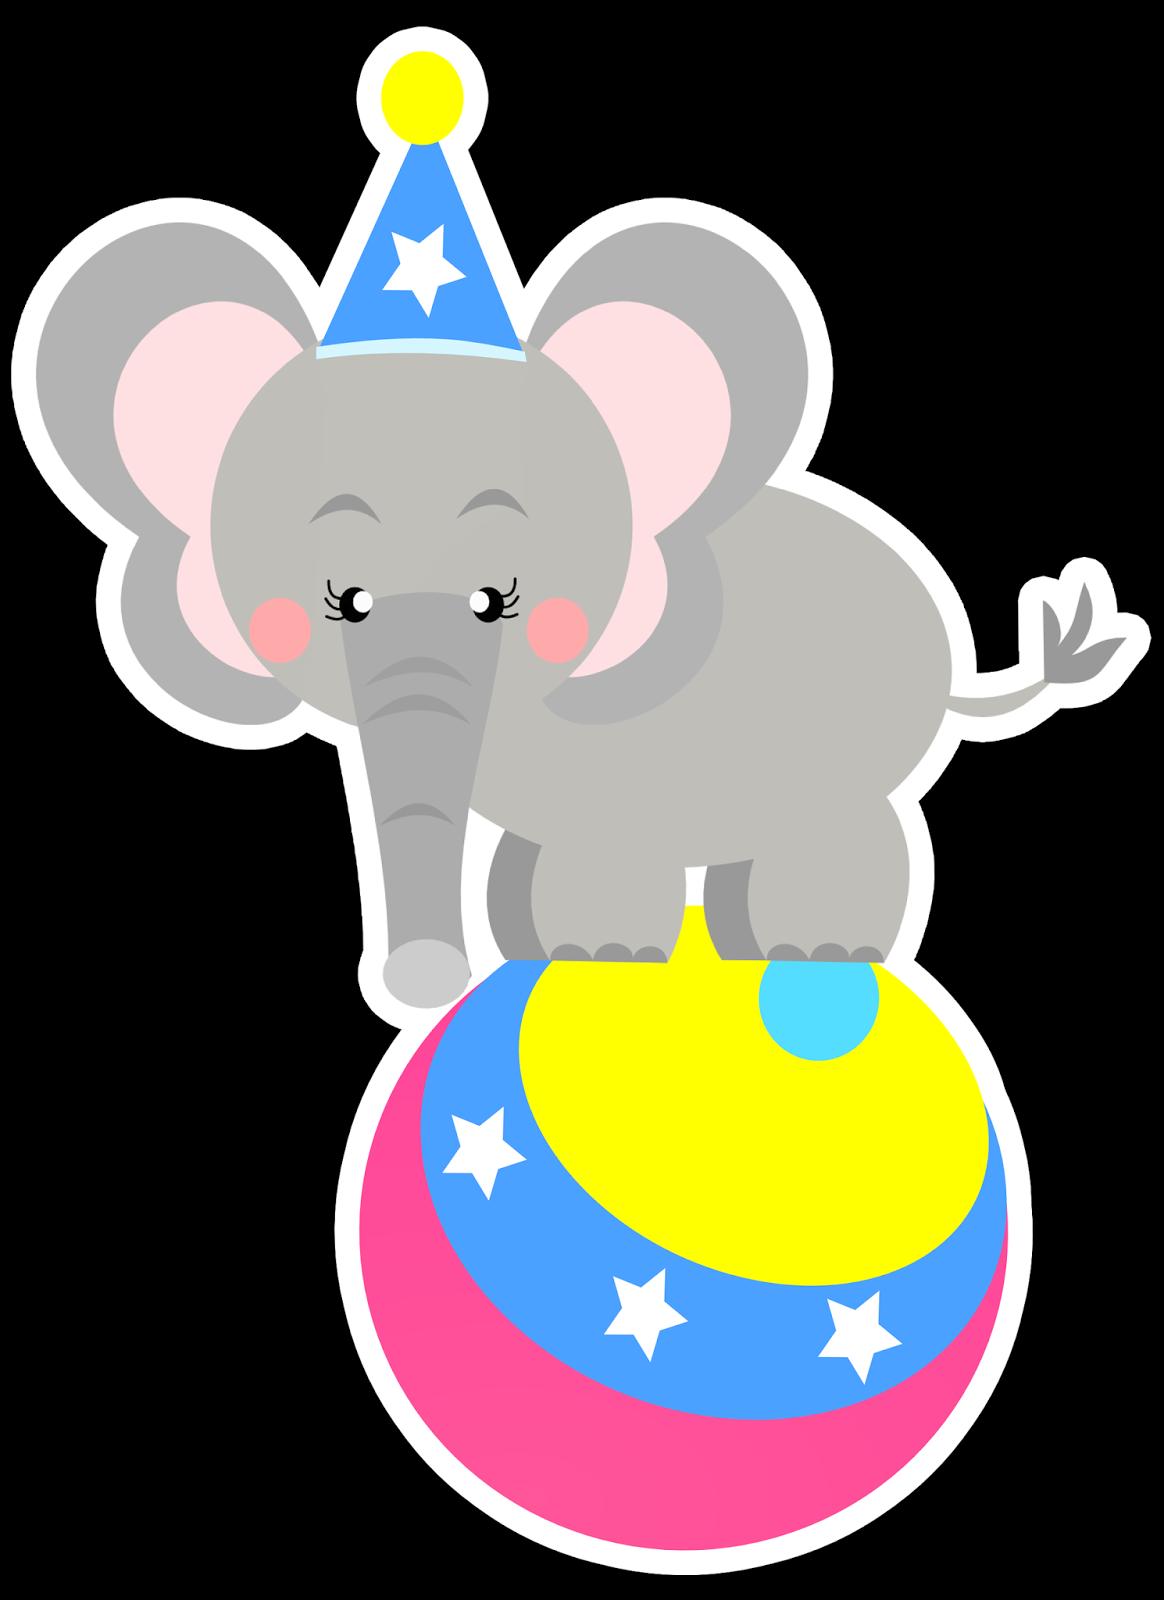 Circus clipart monkey. Montando a minha festa